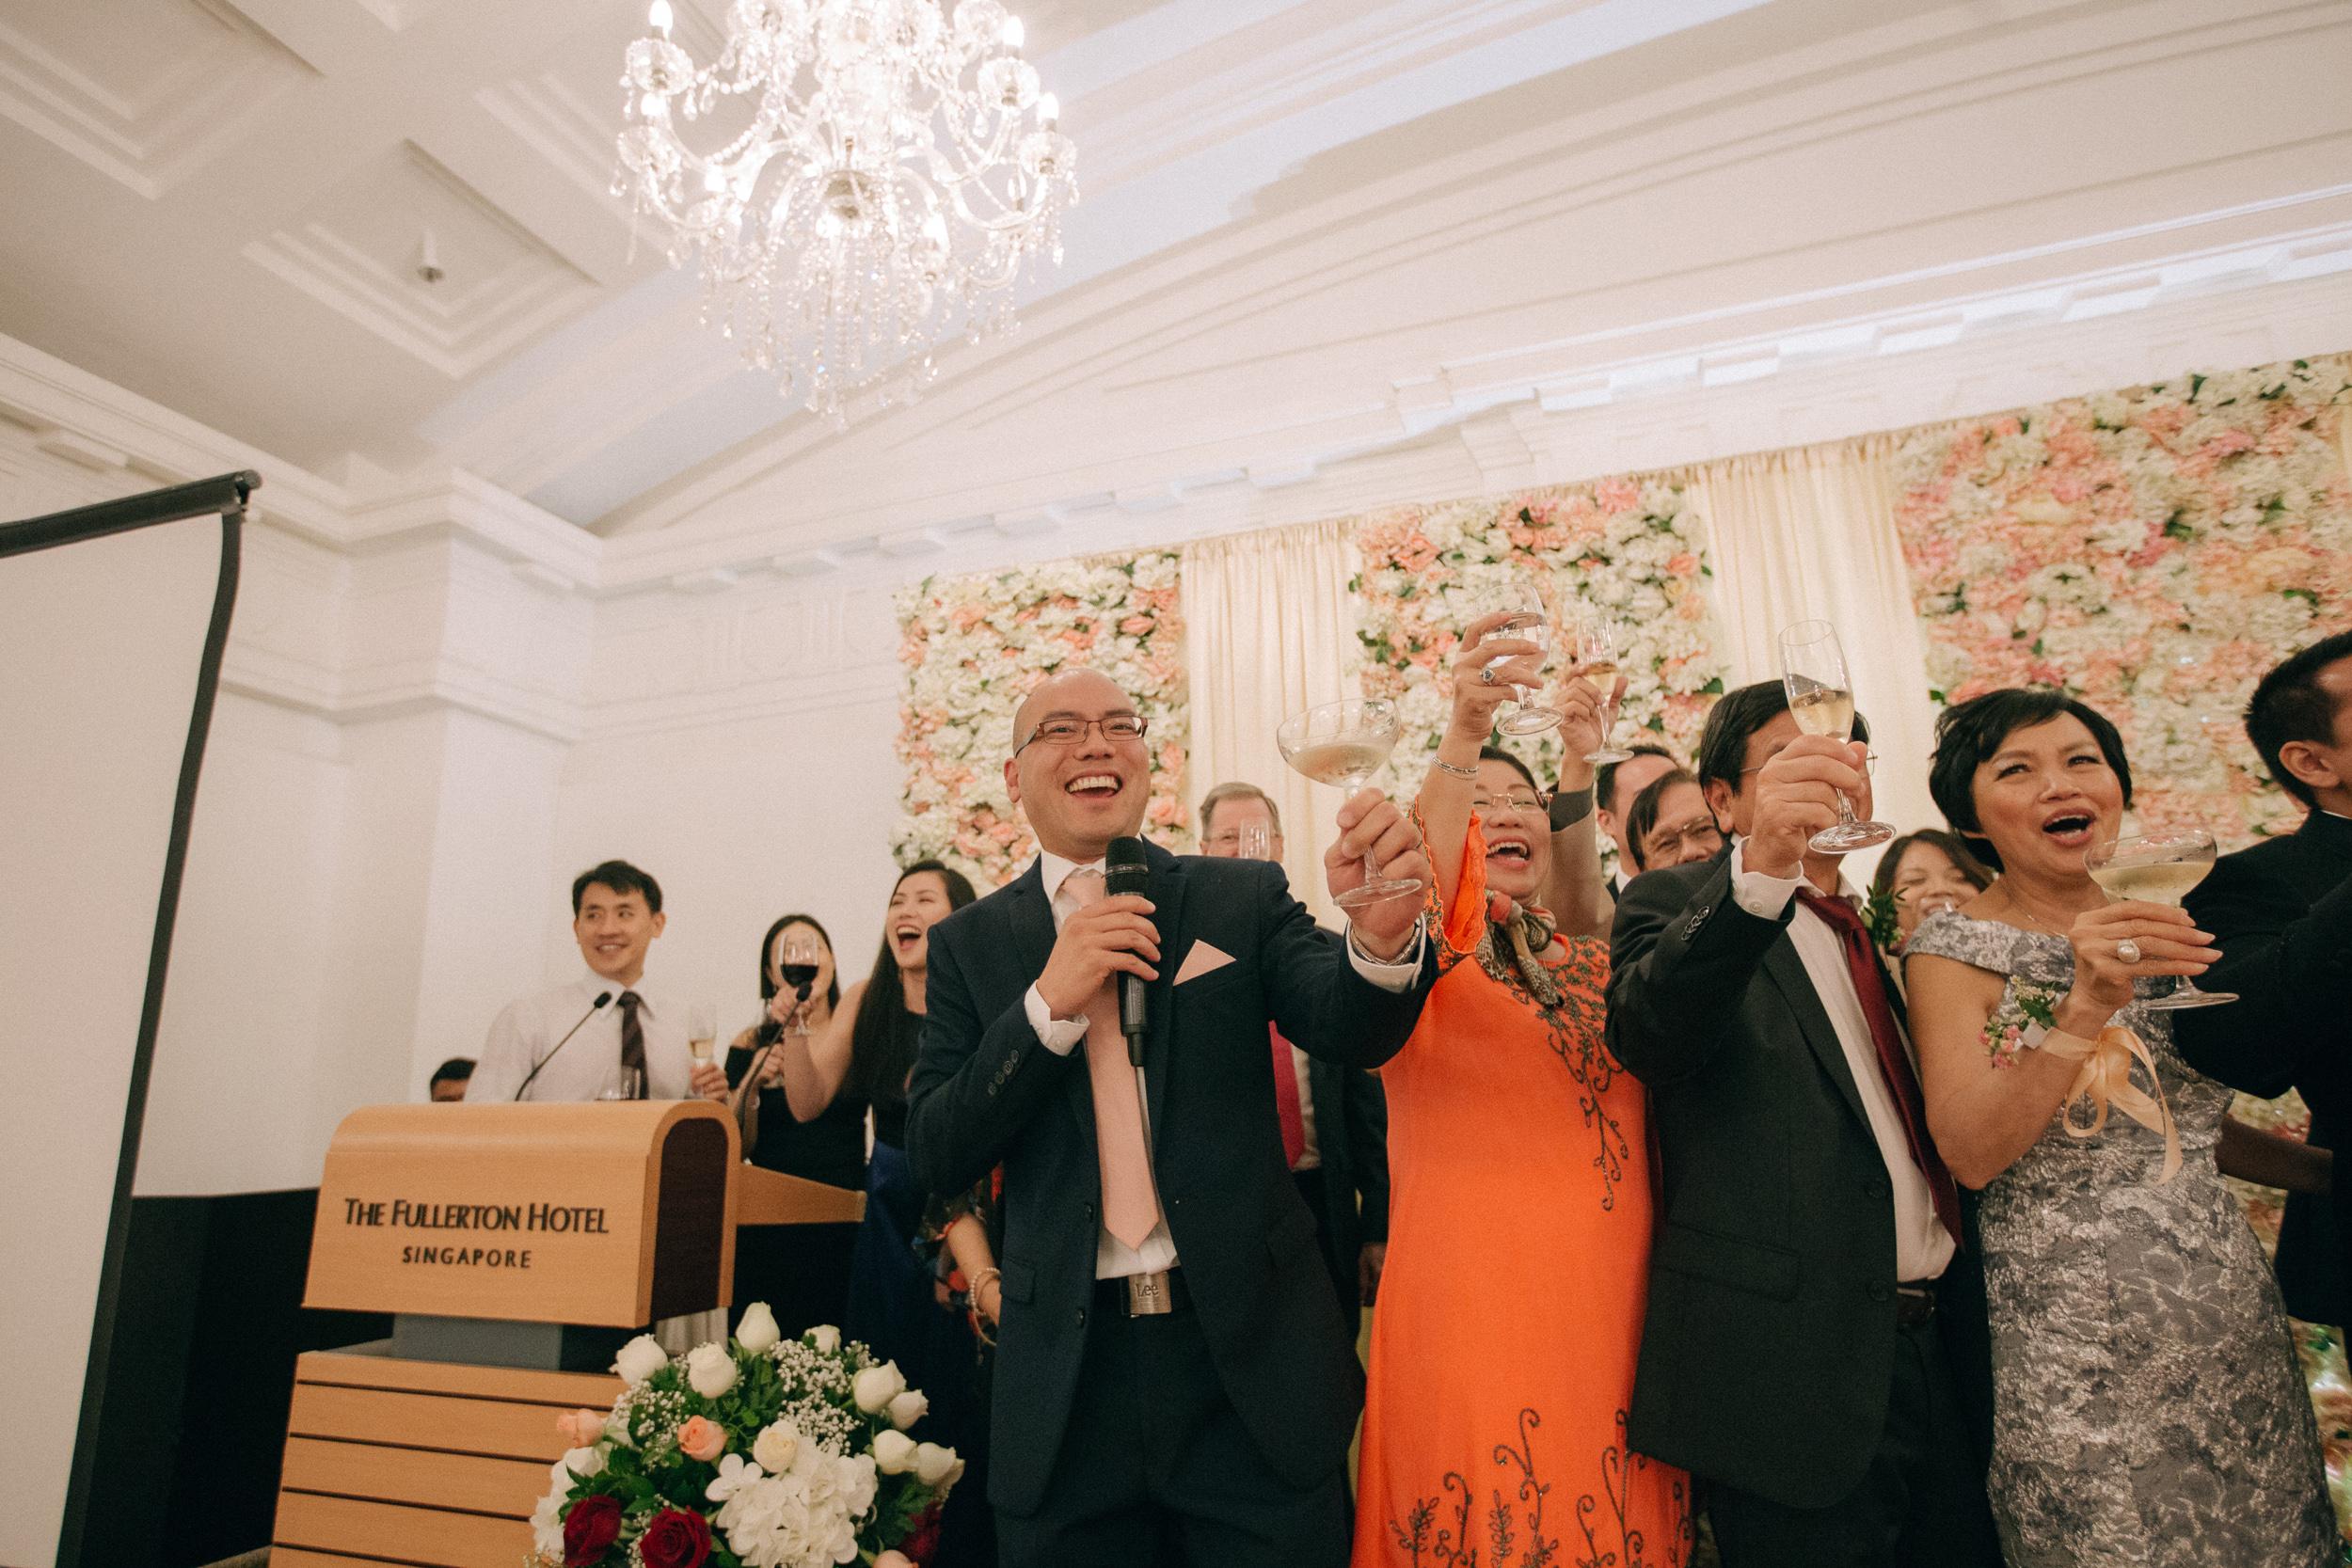 singapore-wedding-photographer-cheryl-matthew-fullerton-hotel-wedding-76.jpg